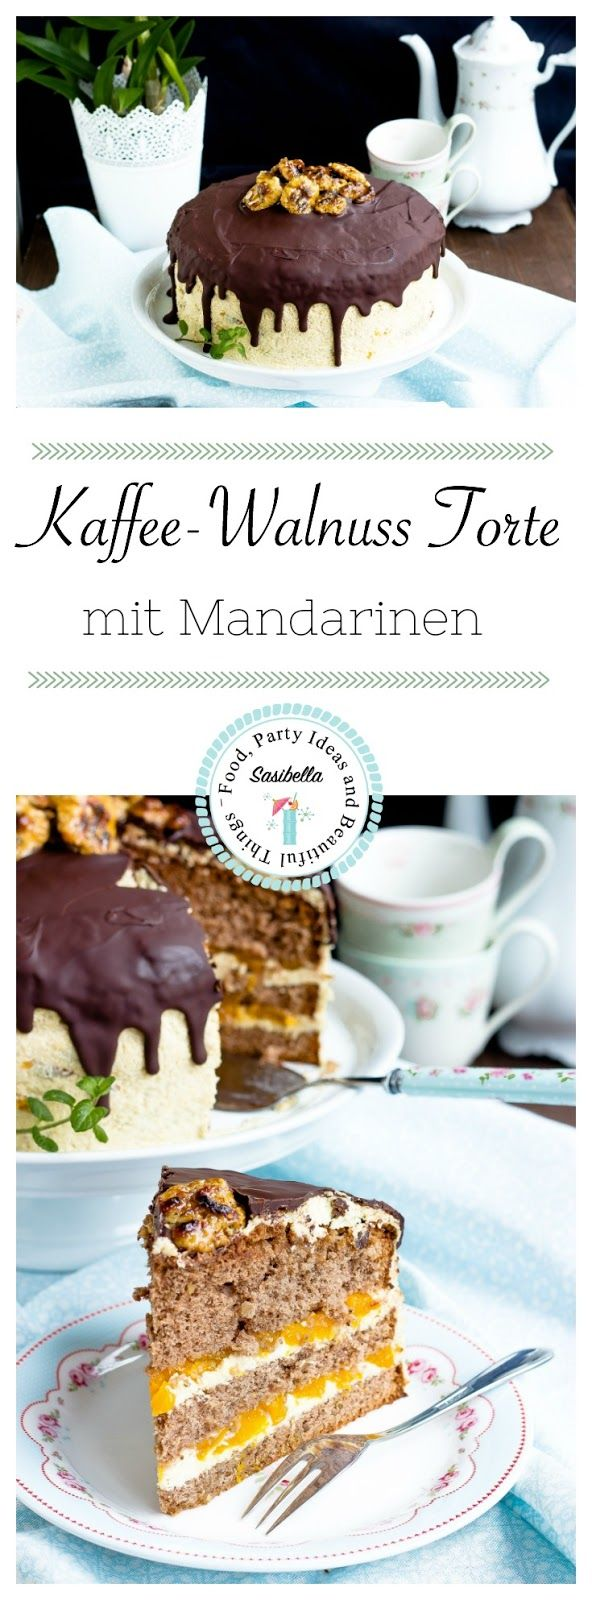 Torten Rezepte & Geburtstagskuchen Ideen. Backen. Rezept Kaffee-Walnuss Torte mit Mandarinen - Sasibella